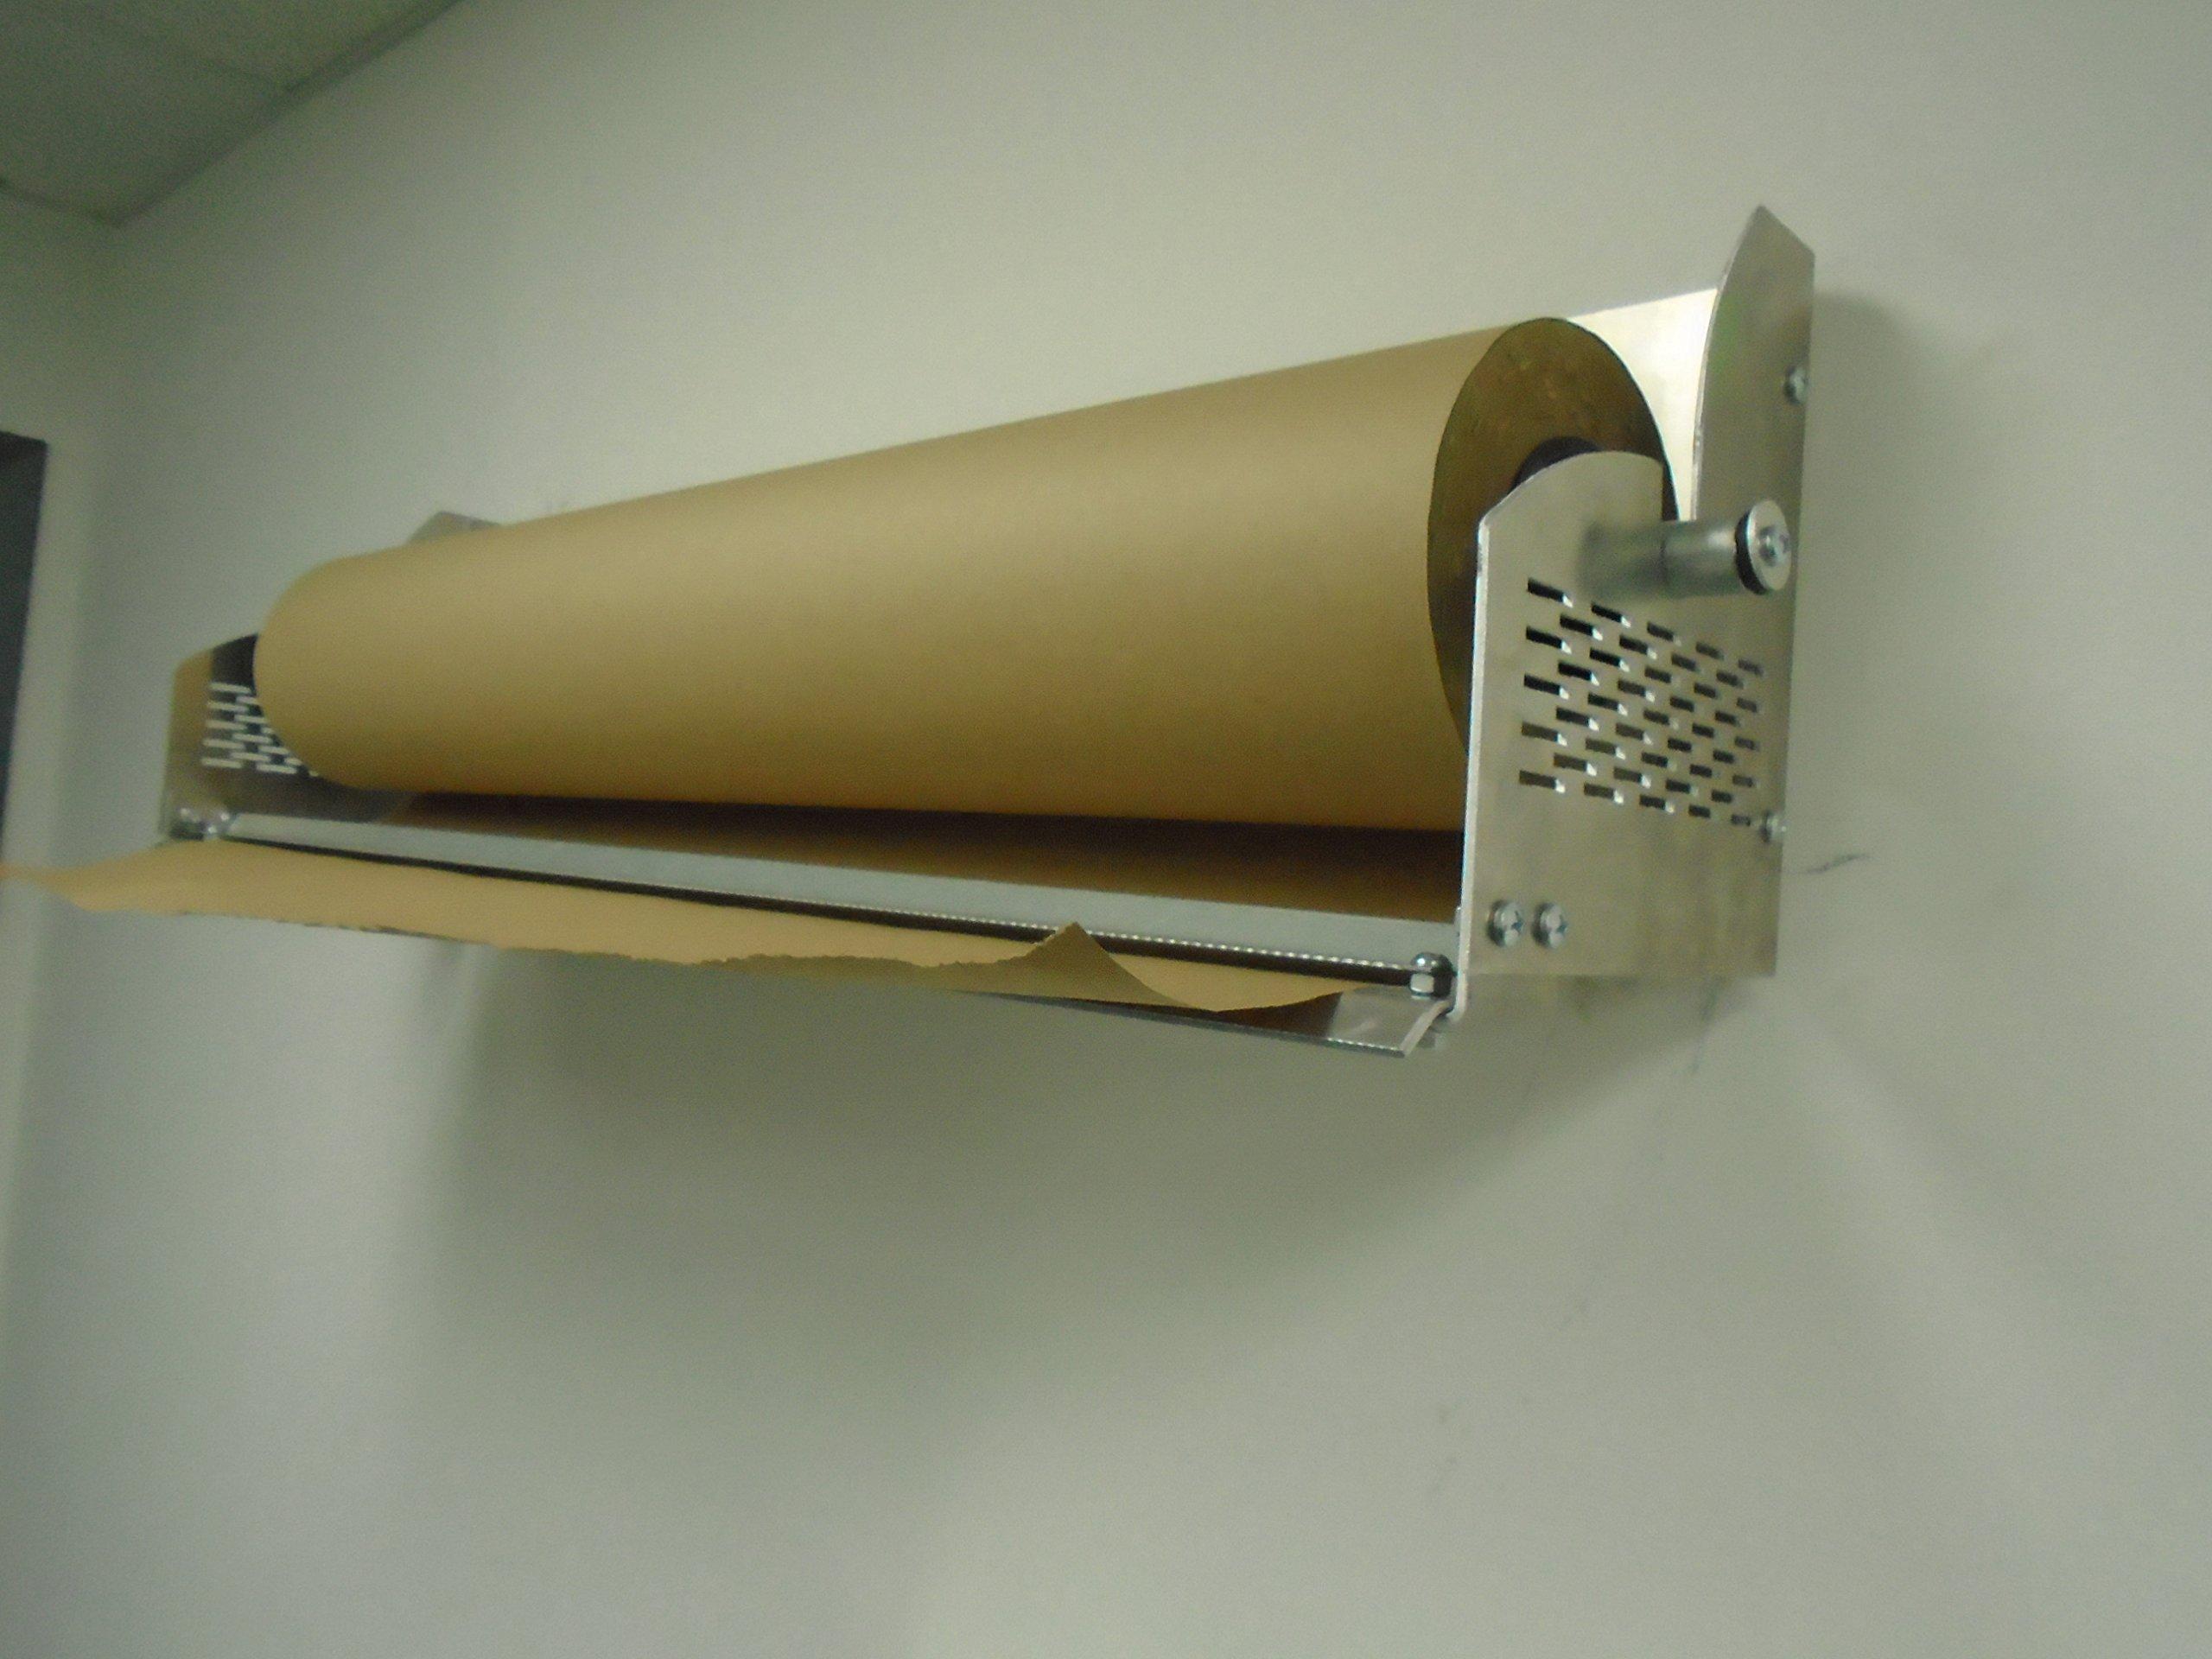 Paper Cutter Roll Dispenser 24 inches wall mount Kraft paper Duralov by Duralov